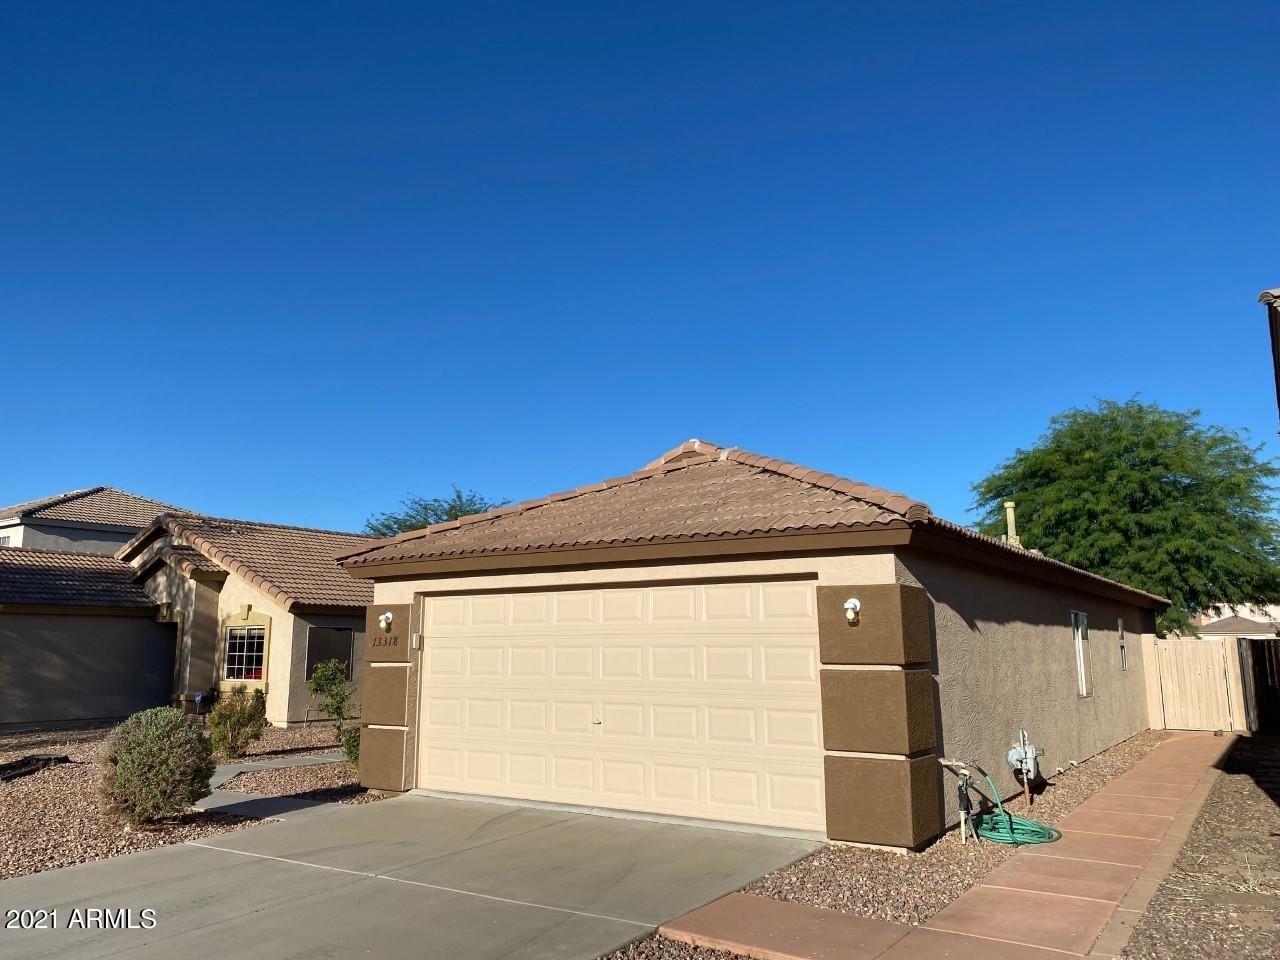 Photo of 13318 N 124TH Lane, El Mirage, AZ 85335 (MLS # 6248371)